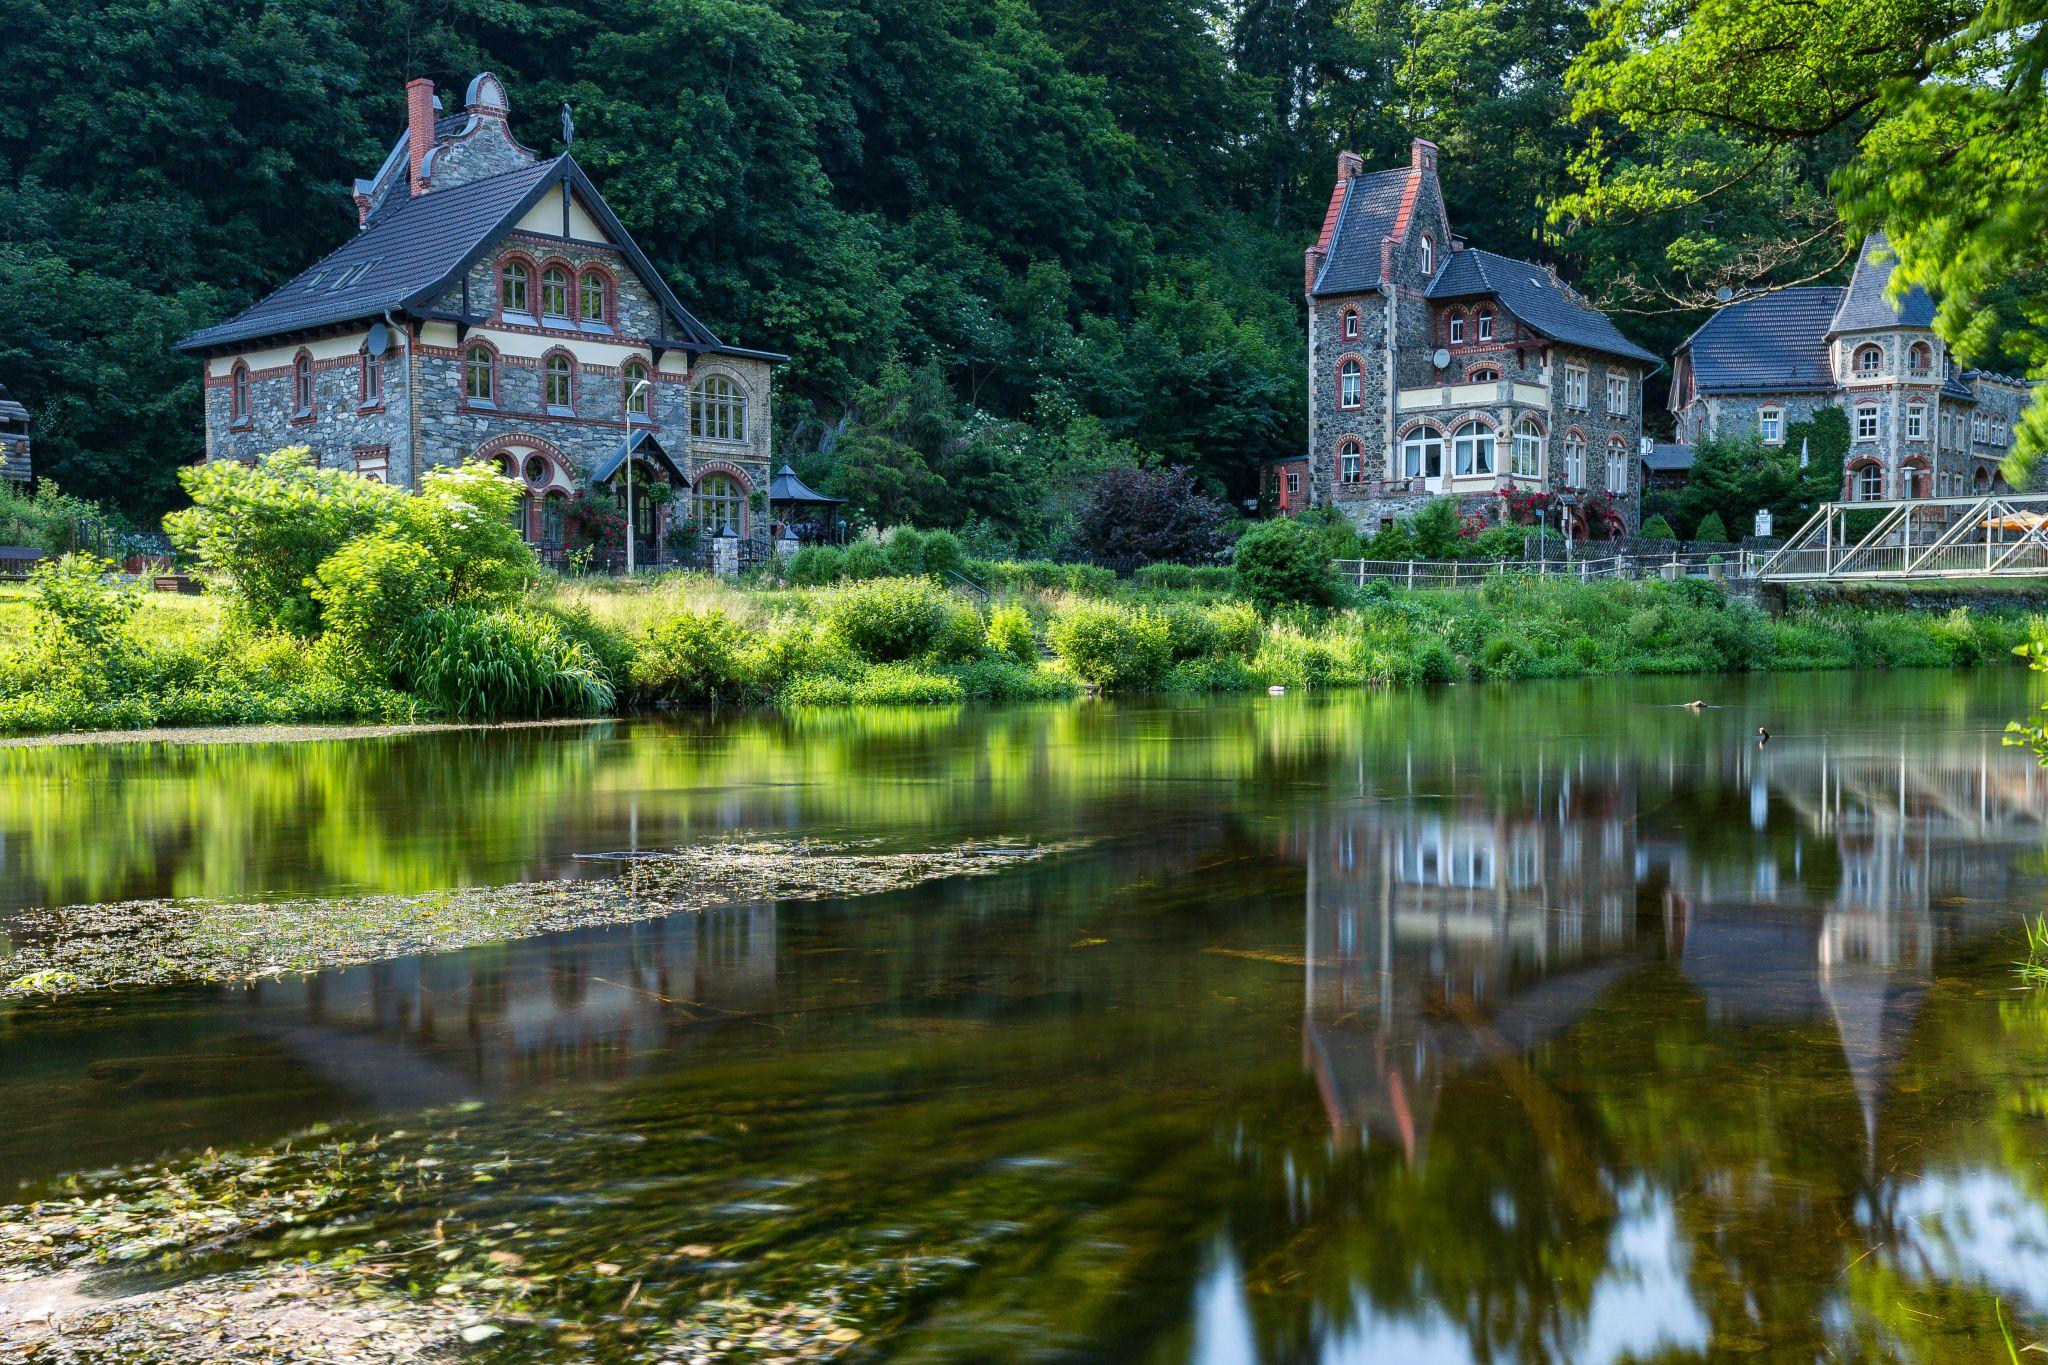 Treseburg houses, Germany